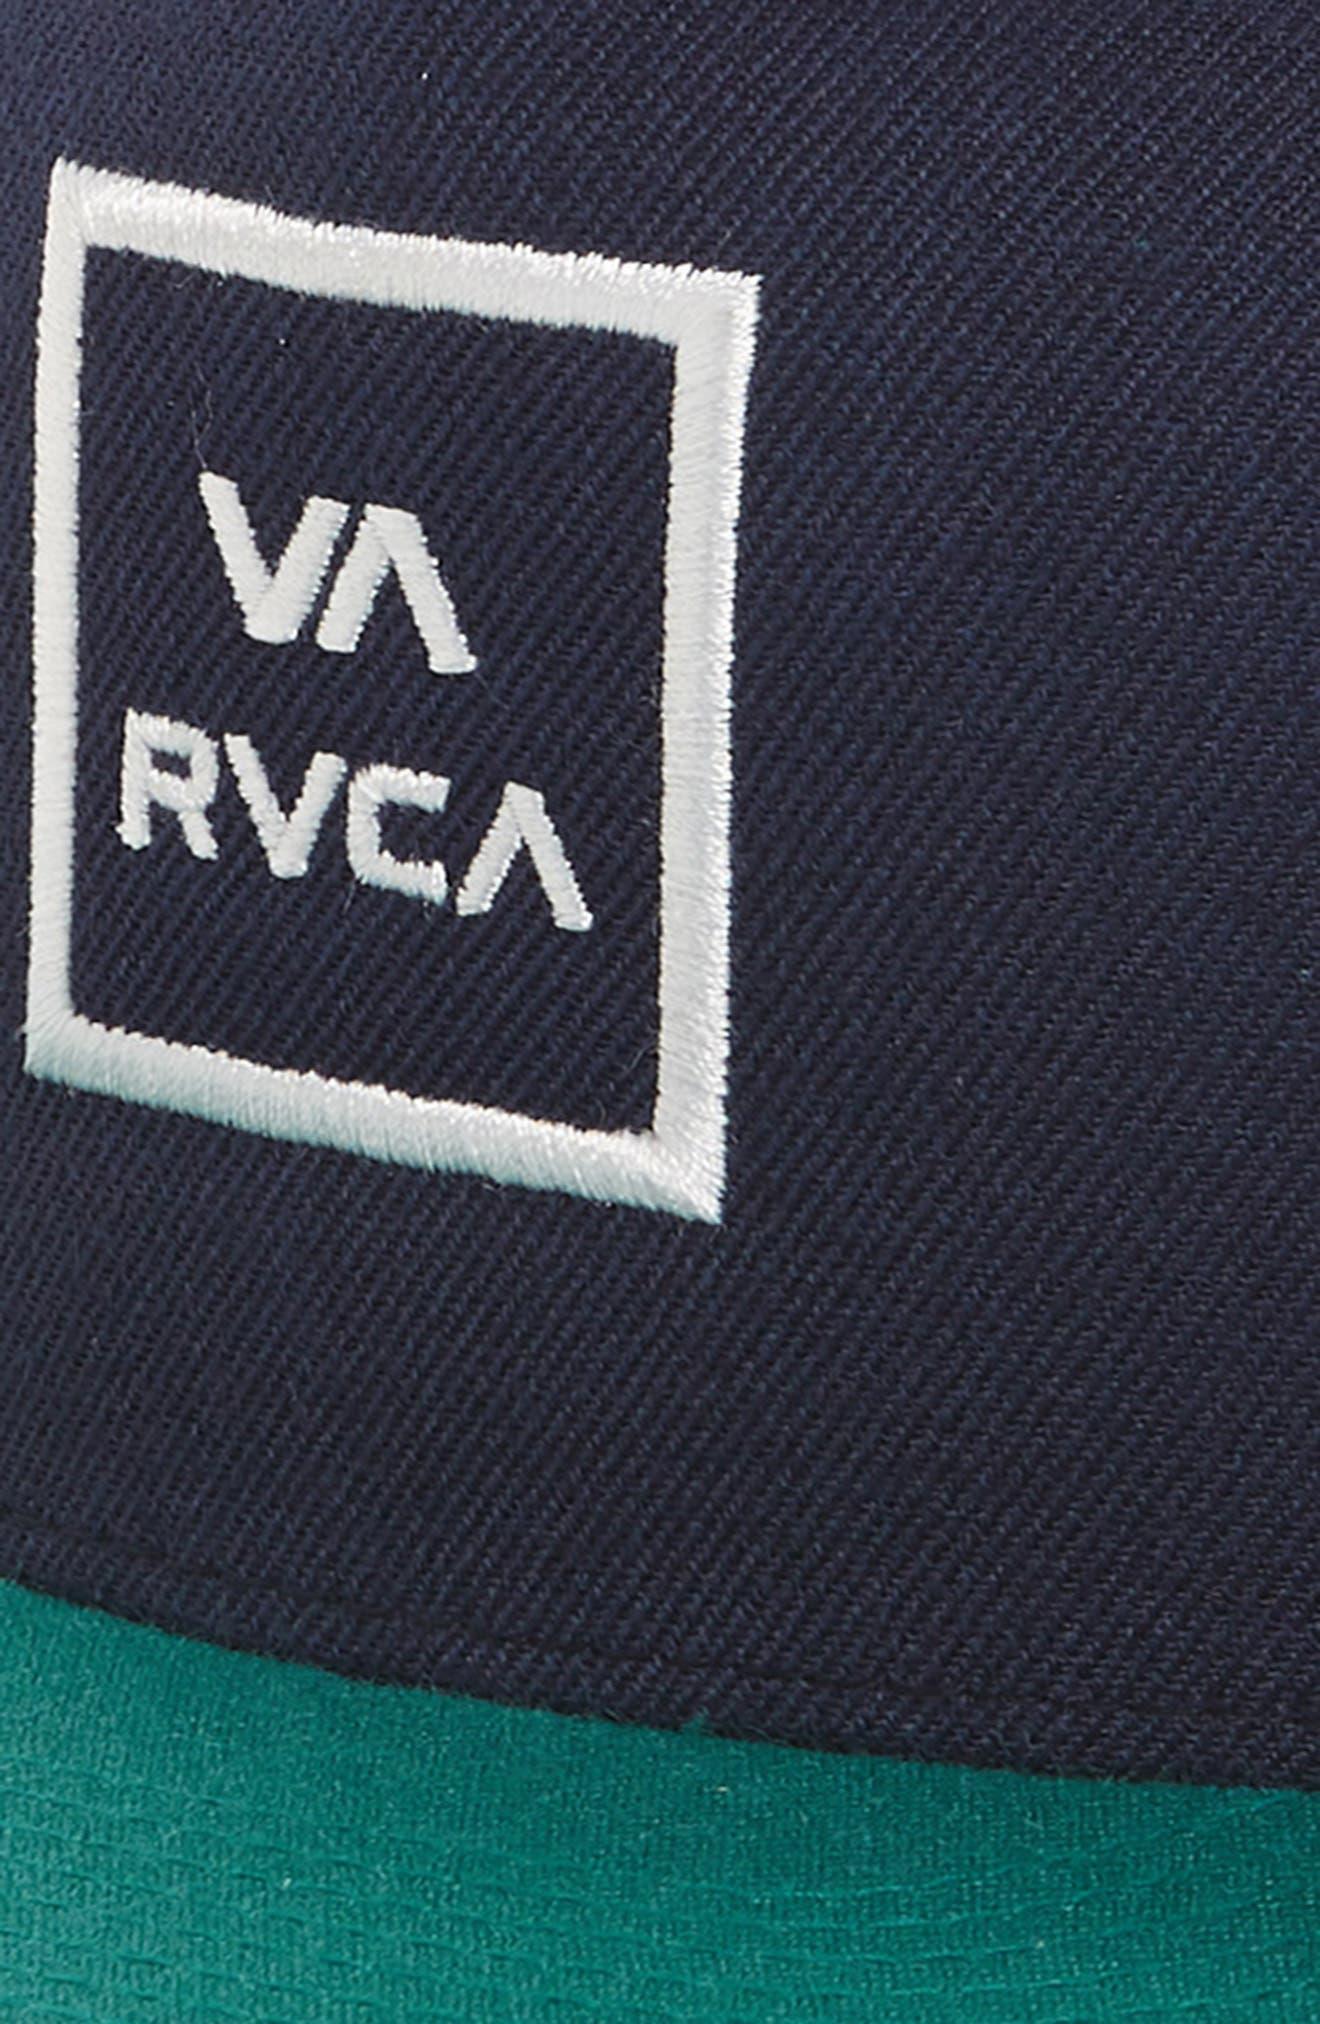 VA All the Way Trucker Hat,                             Alternate thumbnail 3, color,                             Navy/ Teal